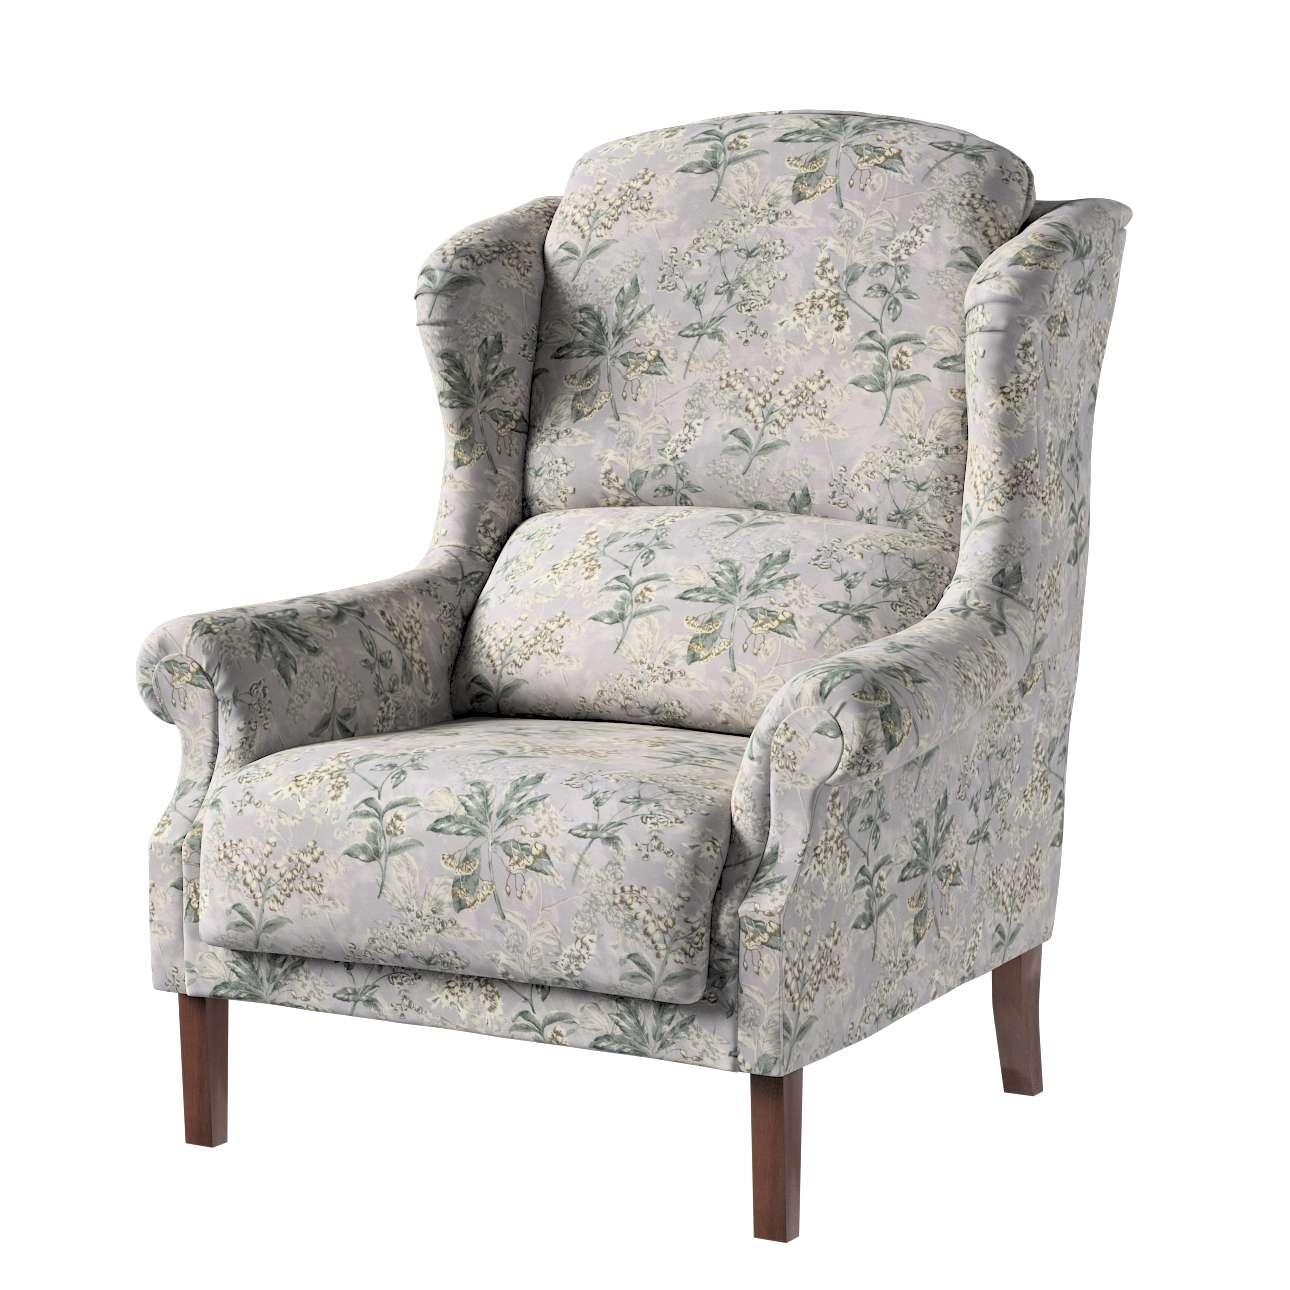 Fotel Unique w kolekcji Londres, tkanina: 143-37